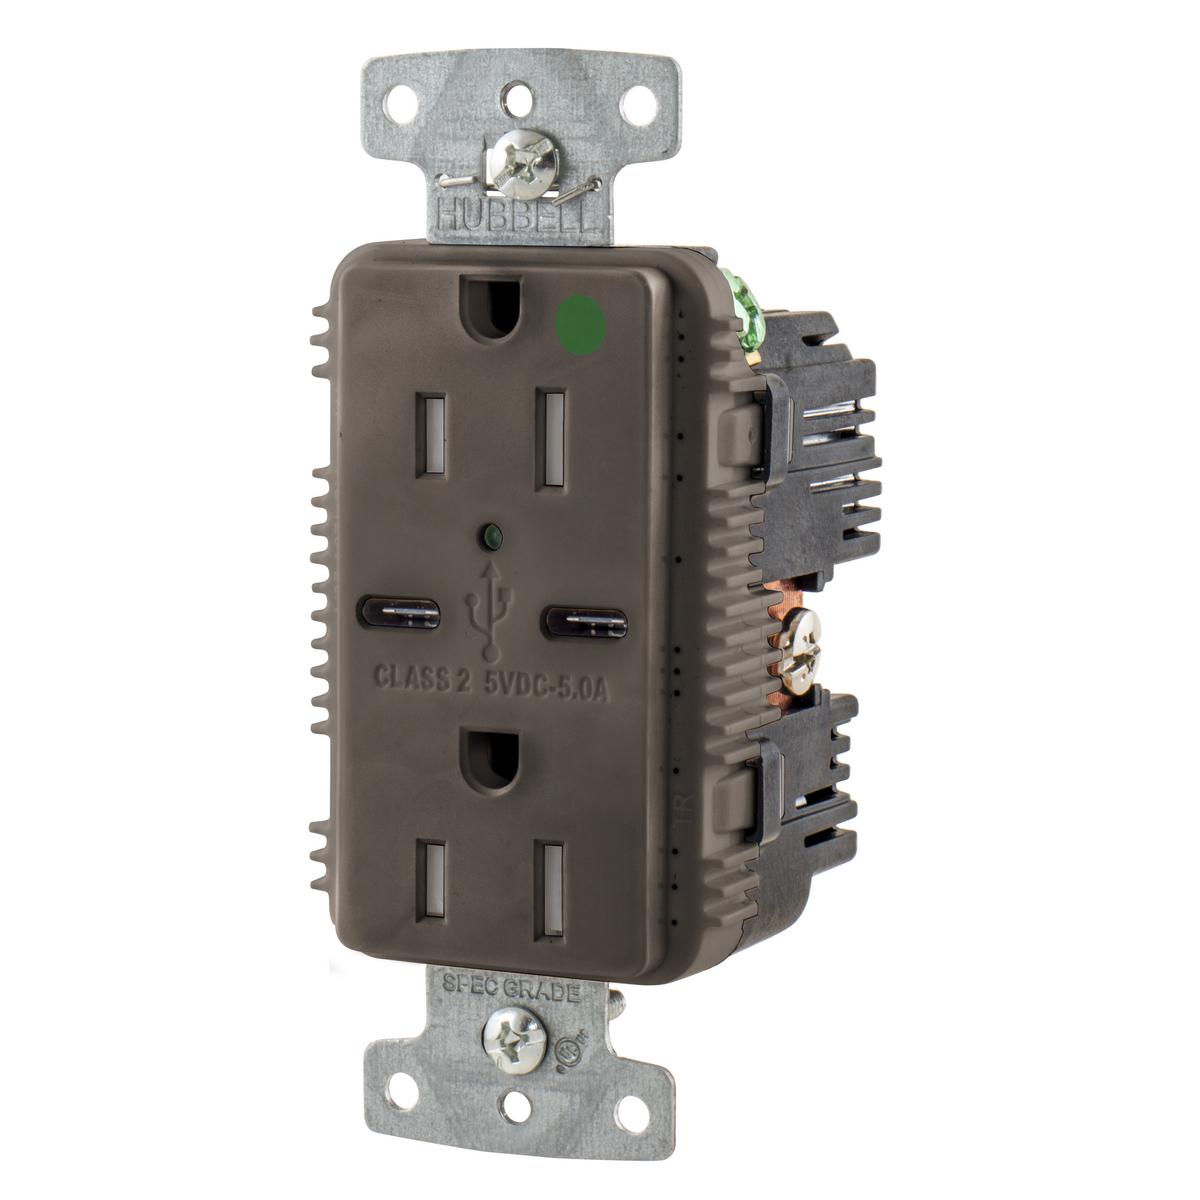 usb8200c5 brand wiring device kellems rh hubbell com